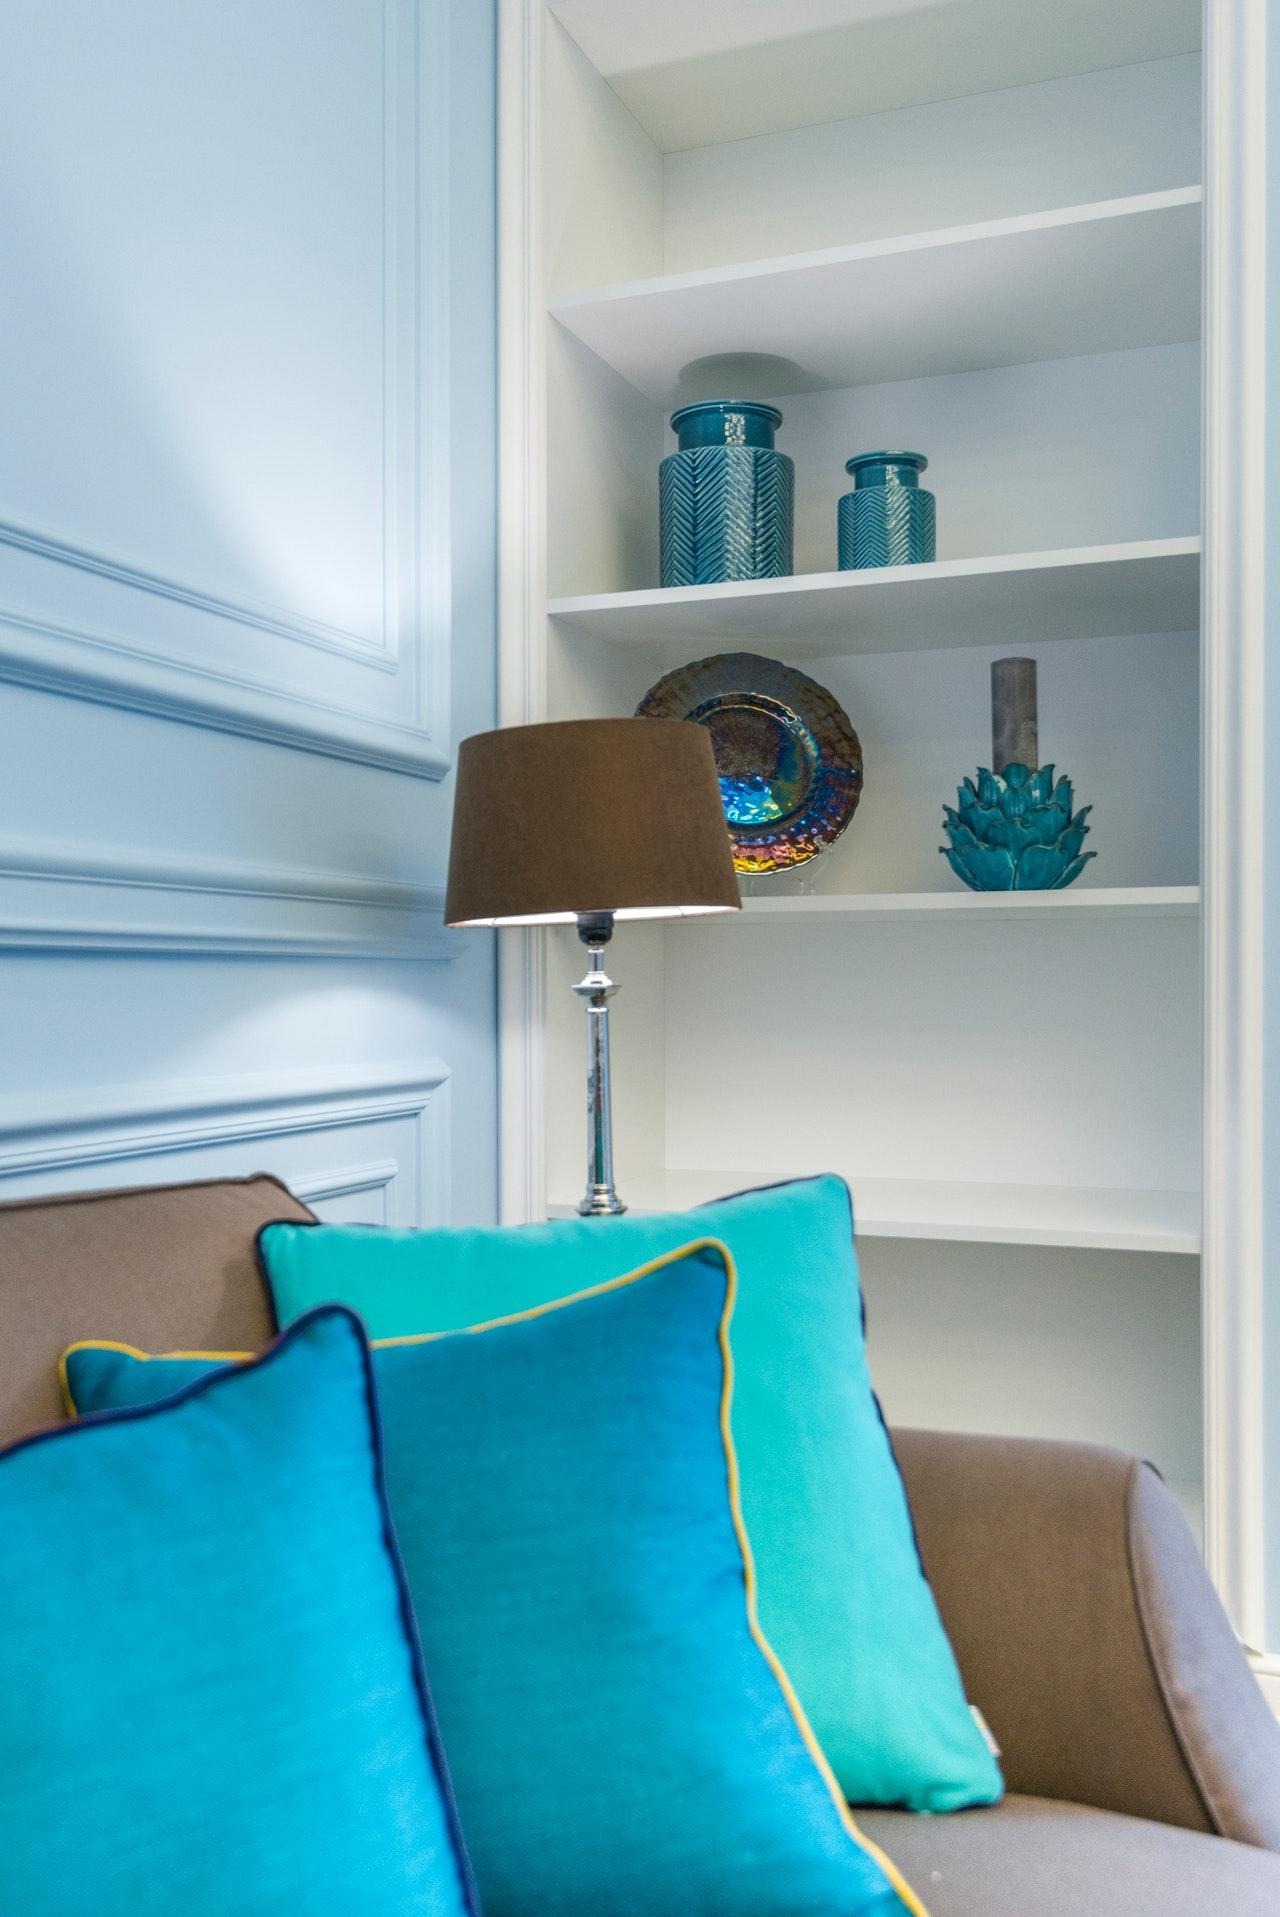 blue pillows on sofa as decor